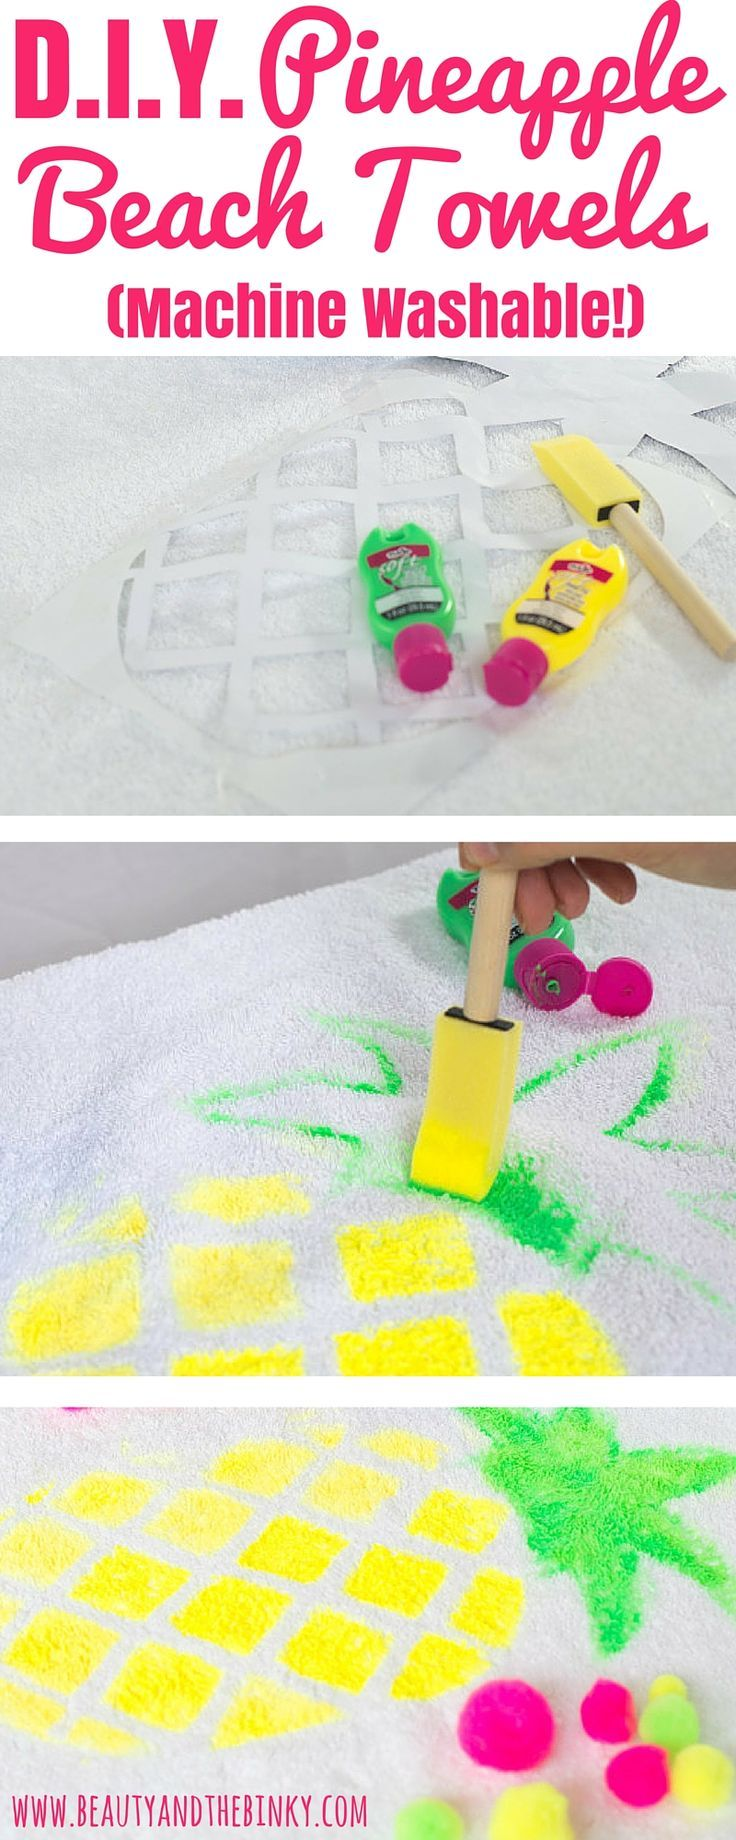 A tropical Summer DIY to create the cutest pineapple beach towel! #sponsored #BringTheTropicsHome: